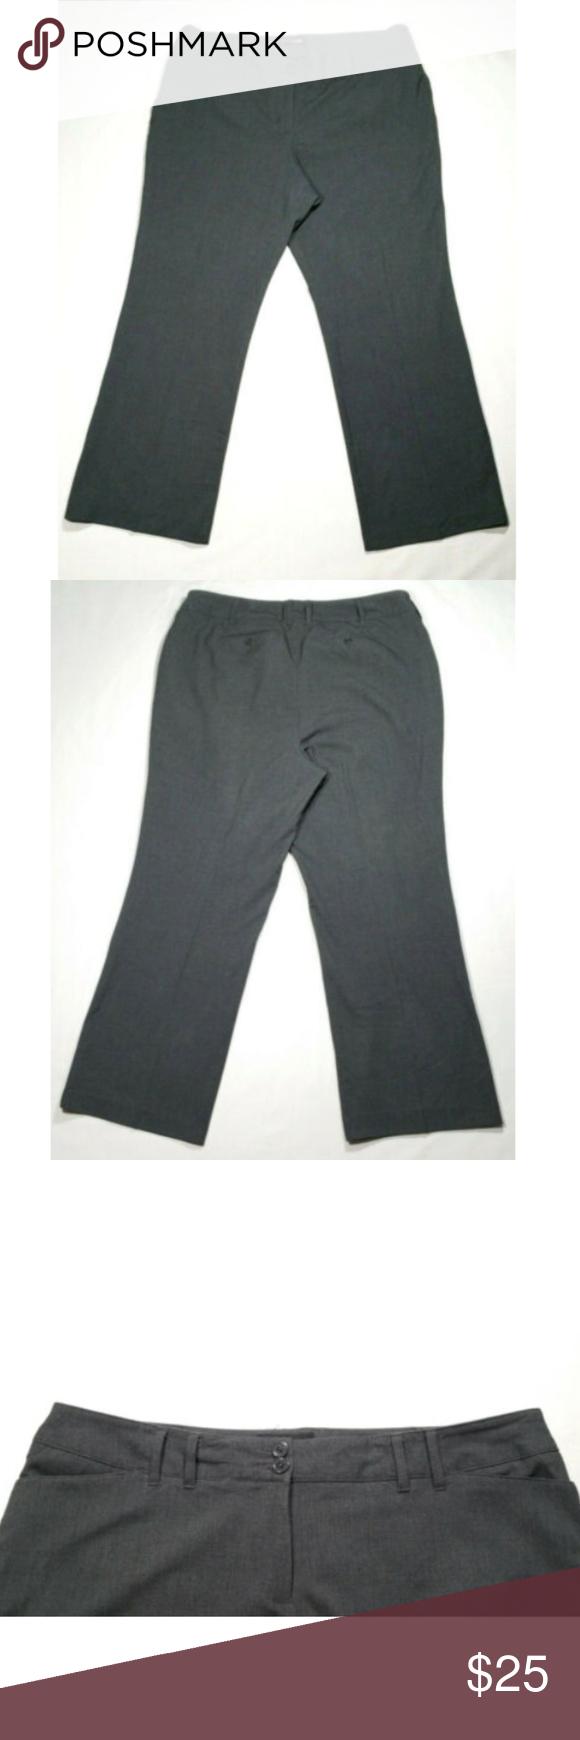 36d76fd4bb7 I just added this listing on Poshmark  LANE BRYANT Wide Leg Career Dress  Pants 2156E2.  shopmycloset  poshmark  fashion  shopping  style  forsale   Lane ...